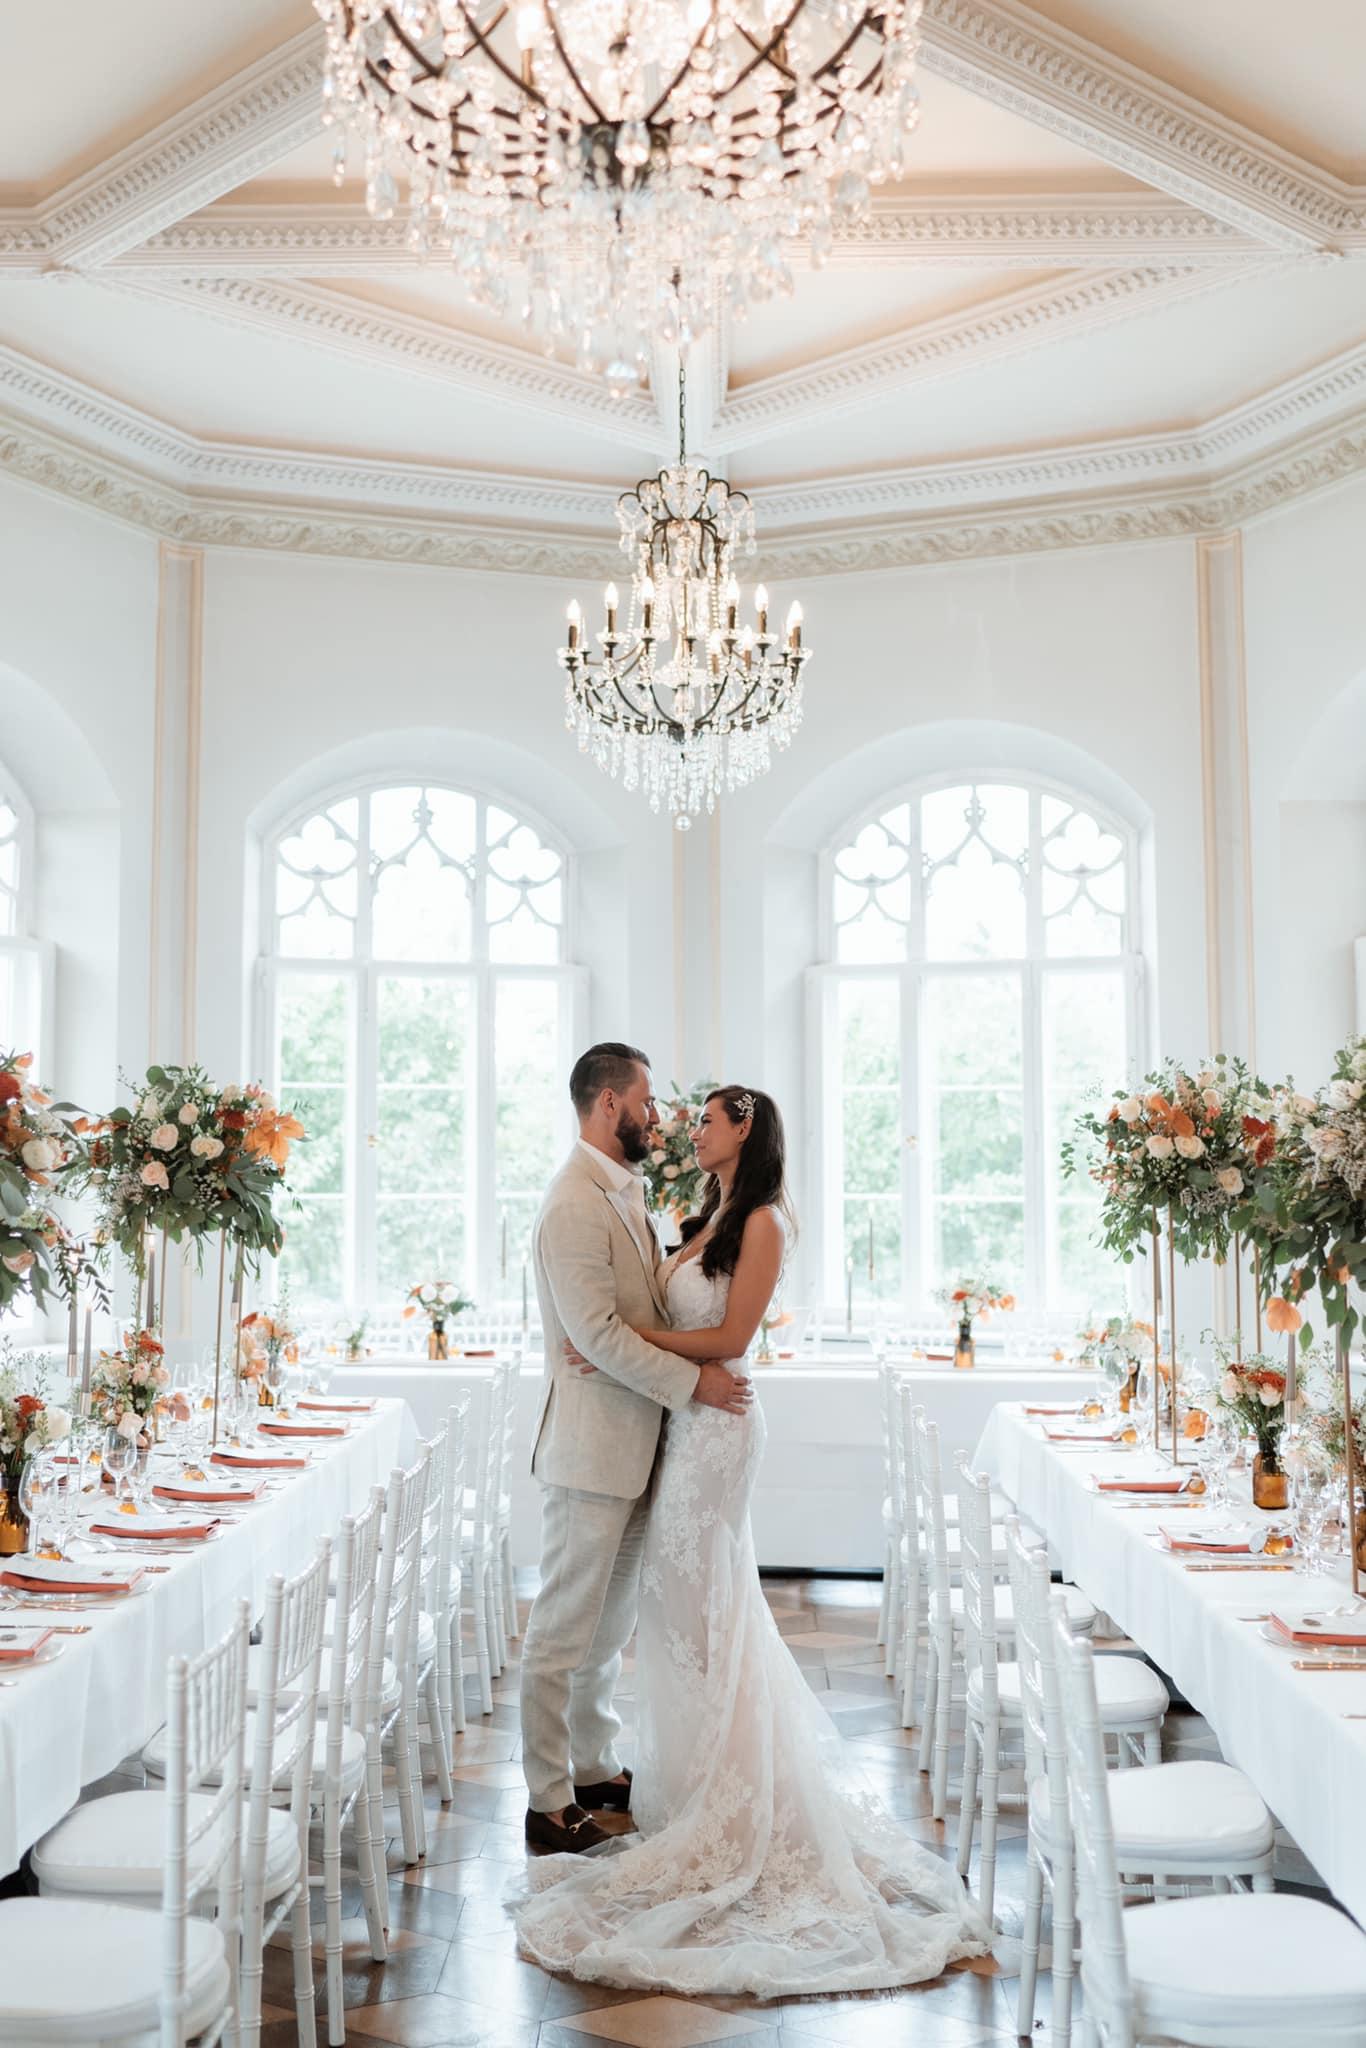 Wedding Award Germany 2021 - Brautpaar im Schloss Gamehl